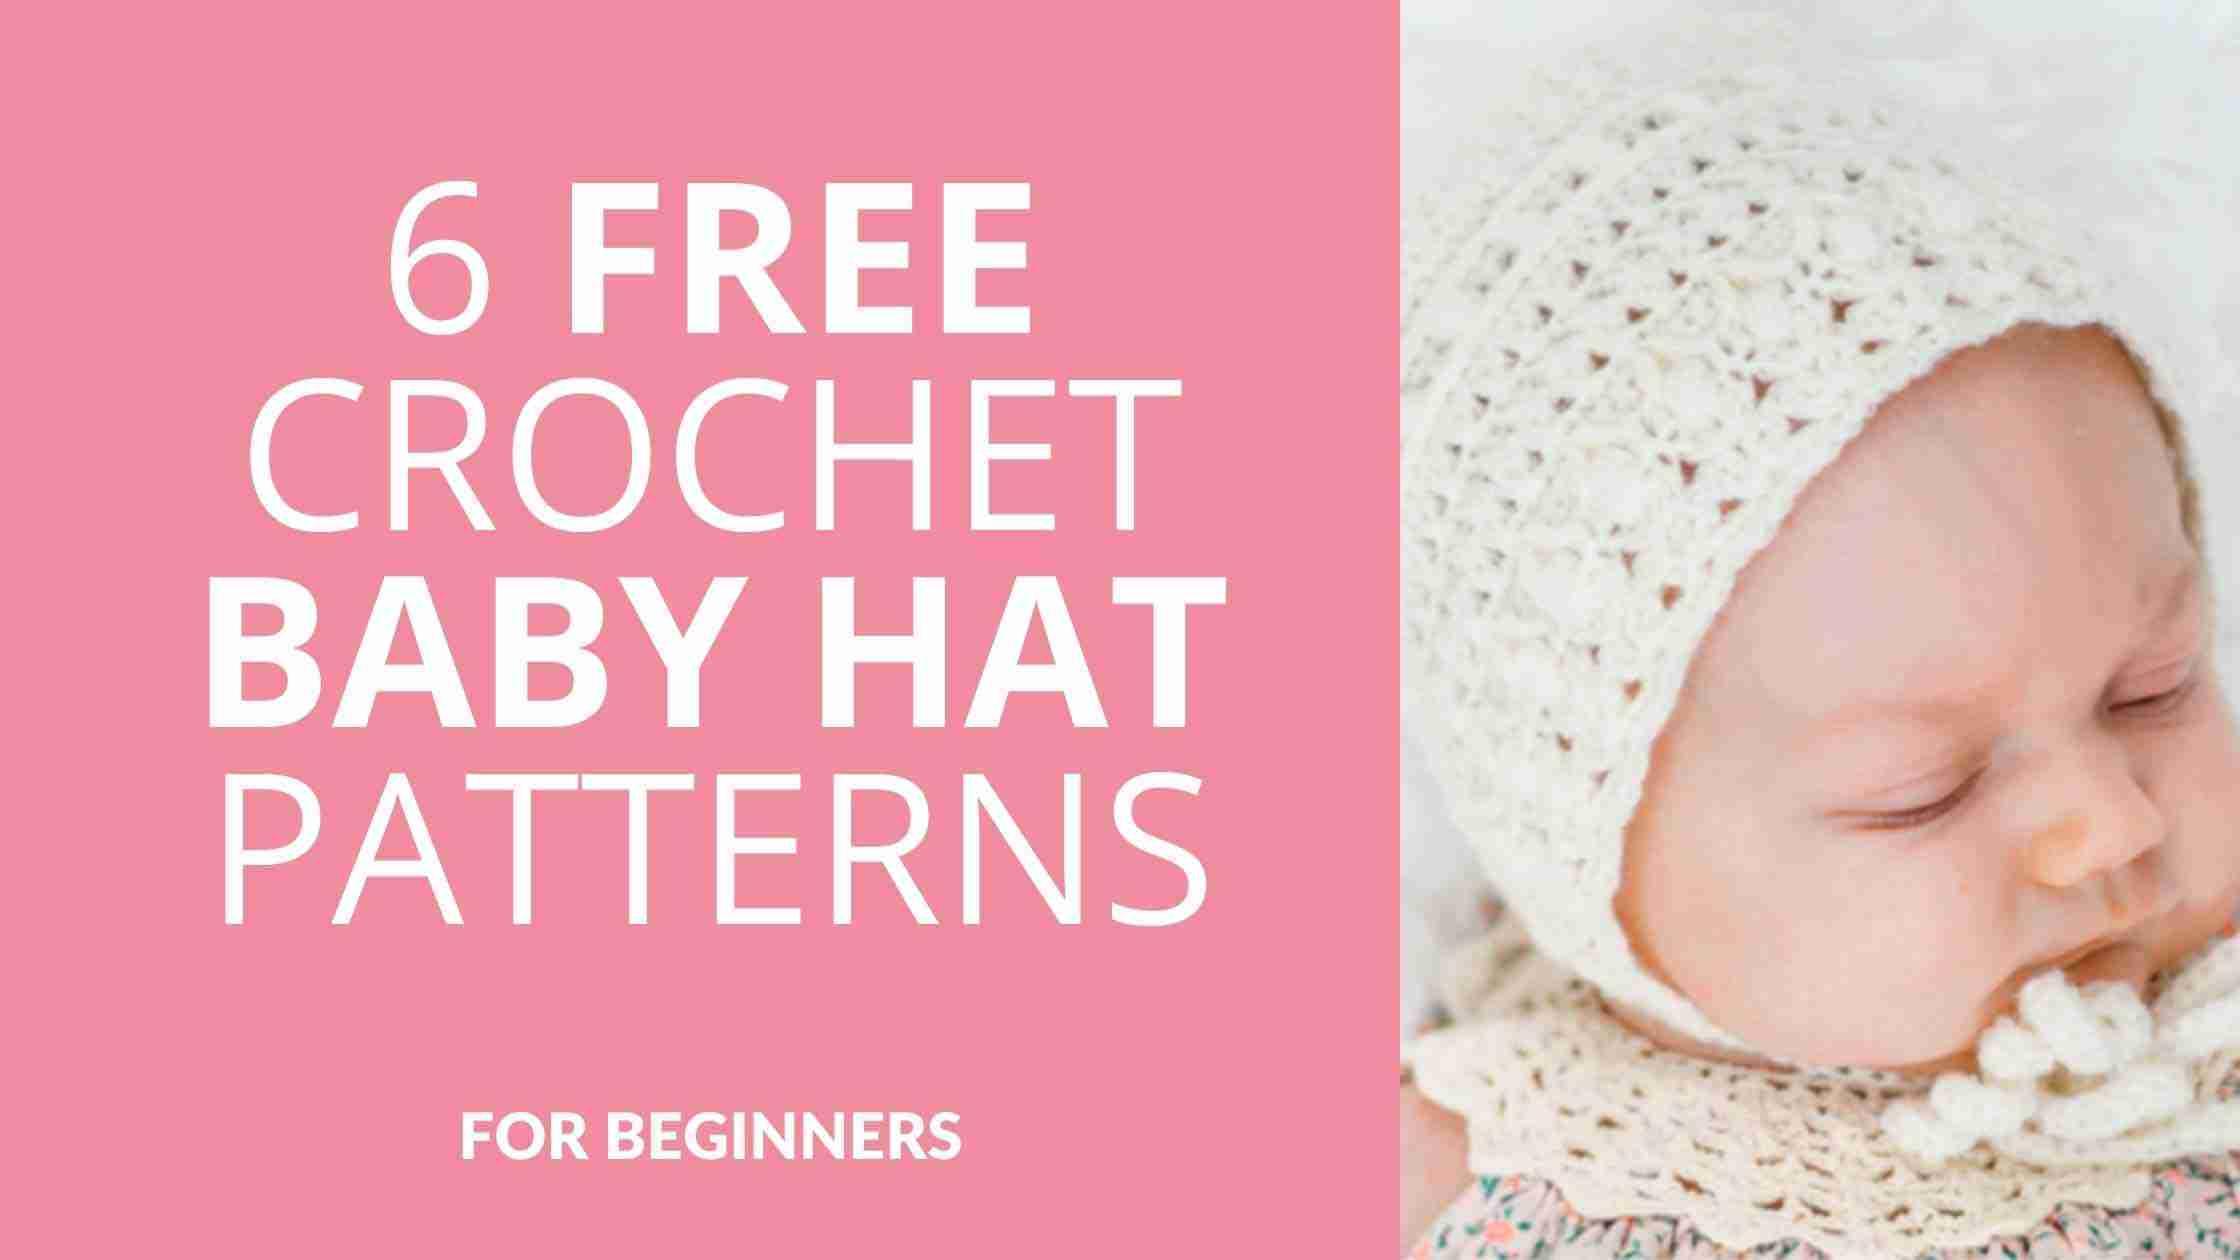 Start Crochet Blog Banners